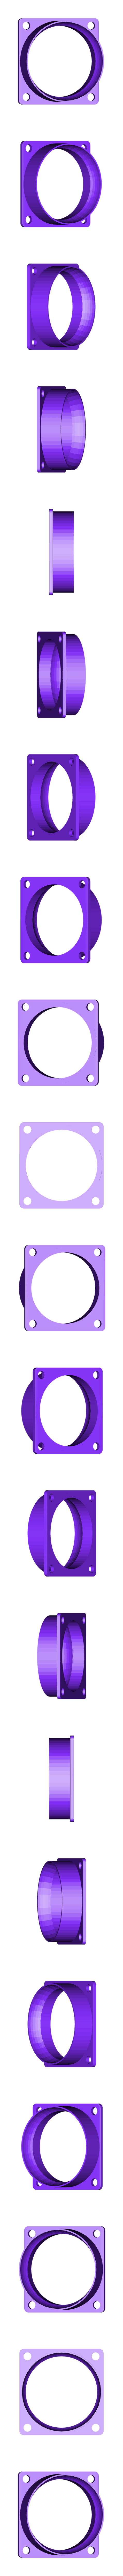 Teclado_gamer_Finger_hold.stl Download free STL file Teclado Gamer • Model to 3D print, CircuitoMaker